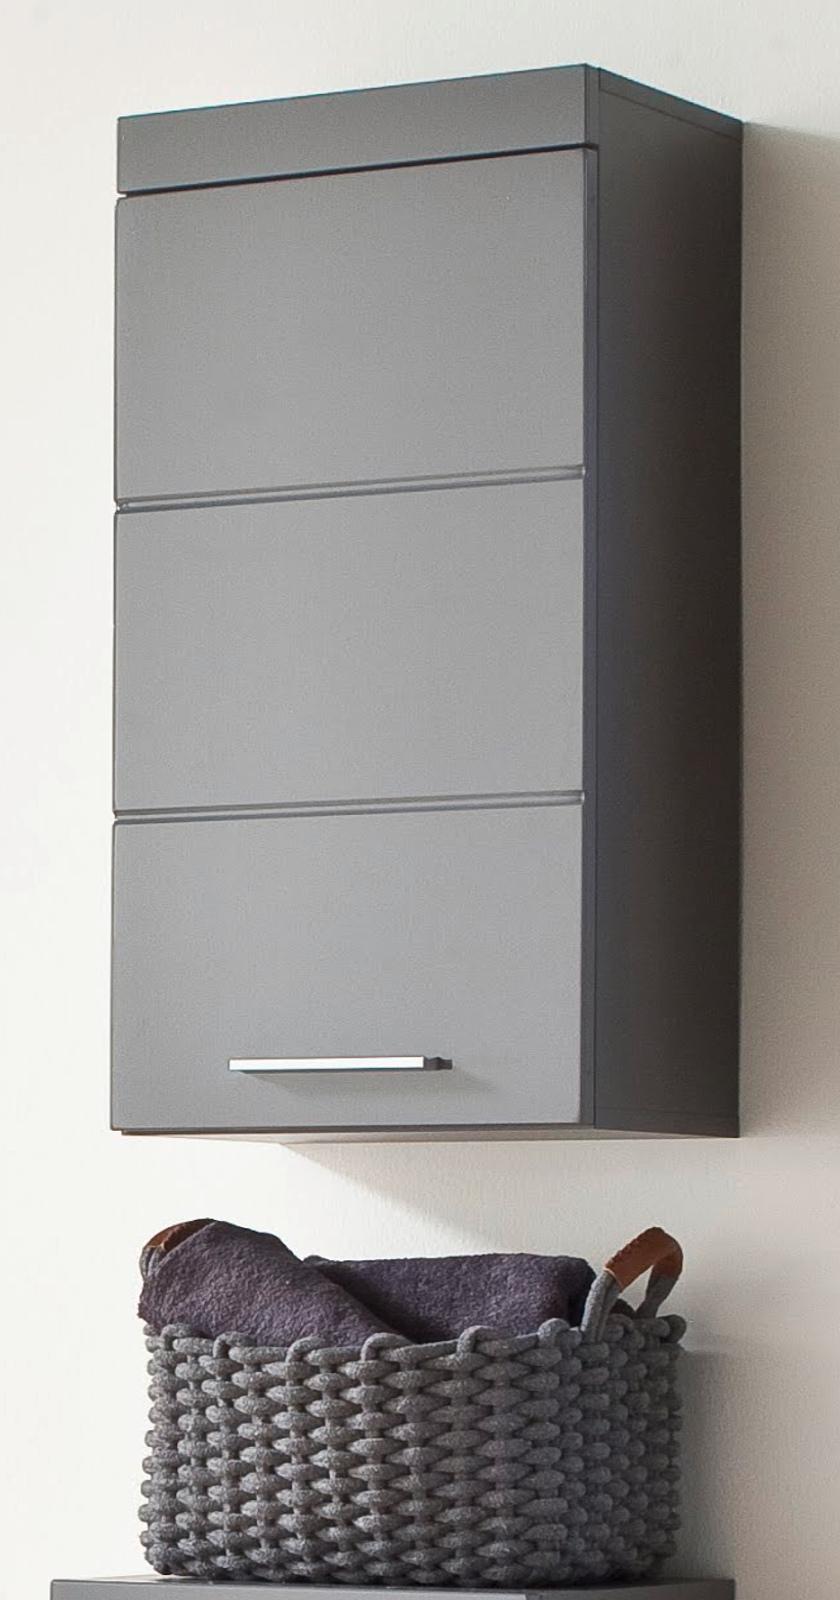 badm bel h ngeschrank amanda in hochglanz grau. Black Bedroom Furniture Sets. Home Design Ideas